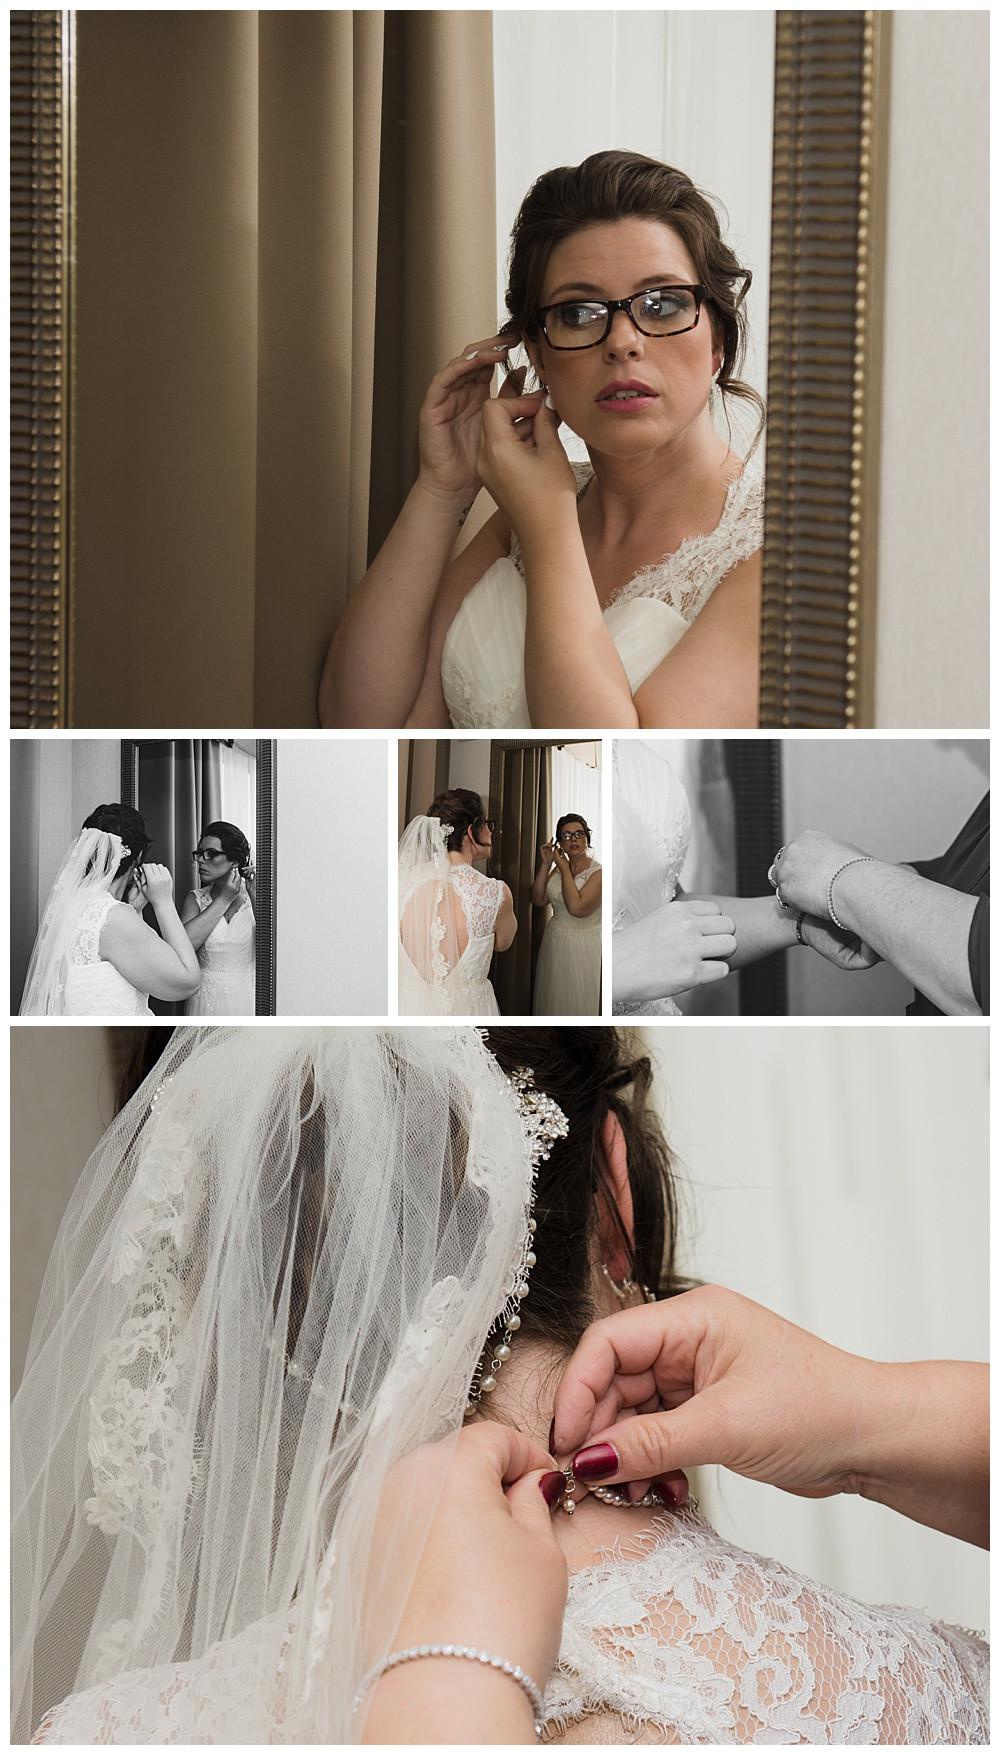 Bride putting on accessories, Holiday Inn and Suites Kanata, Ottawa Wedding Photographer, Ottawa Boudoir Photographer